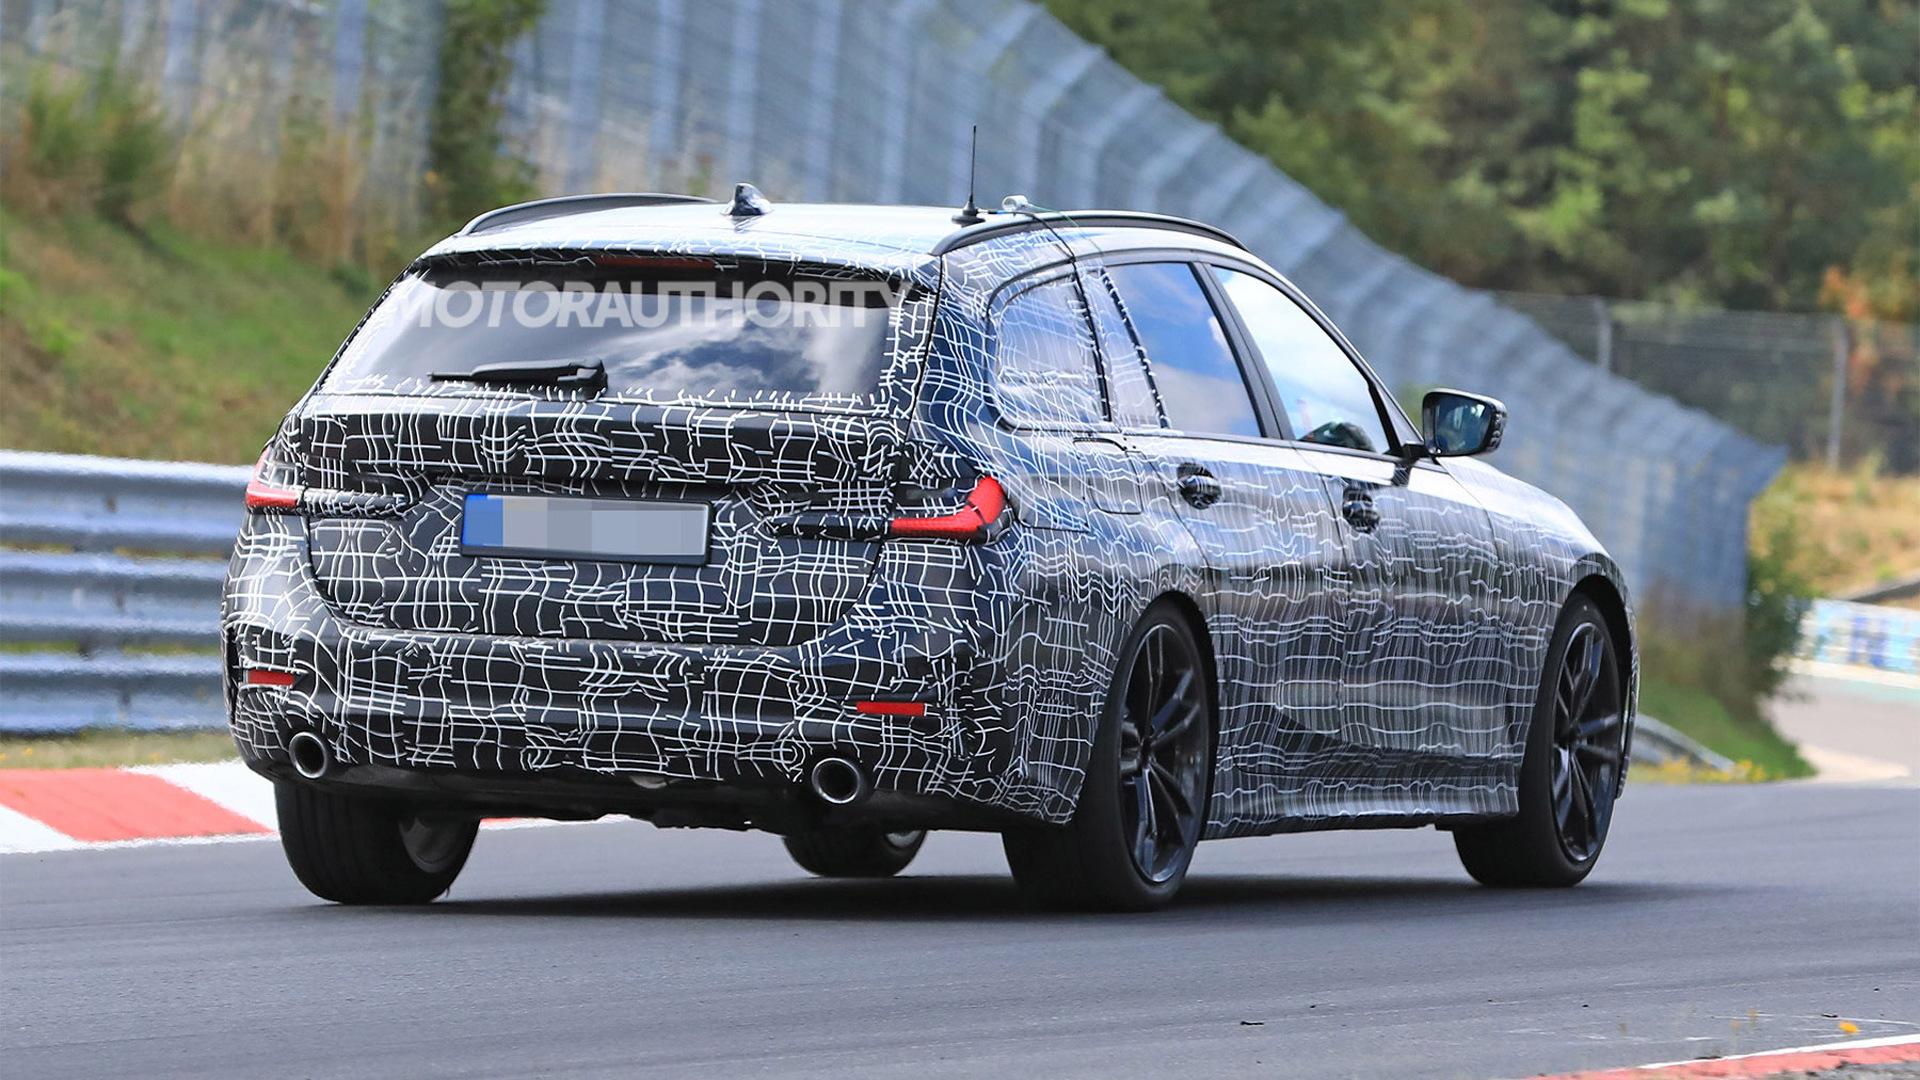 2020 BMW 3-Series Sports Wagon spy shots - Image via S. Baldauf/SB-Medien